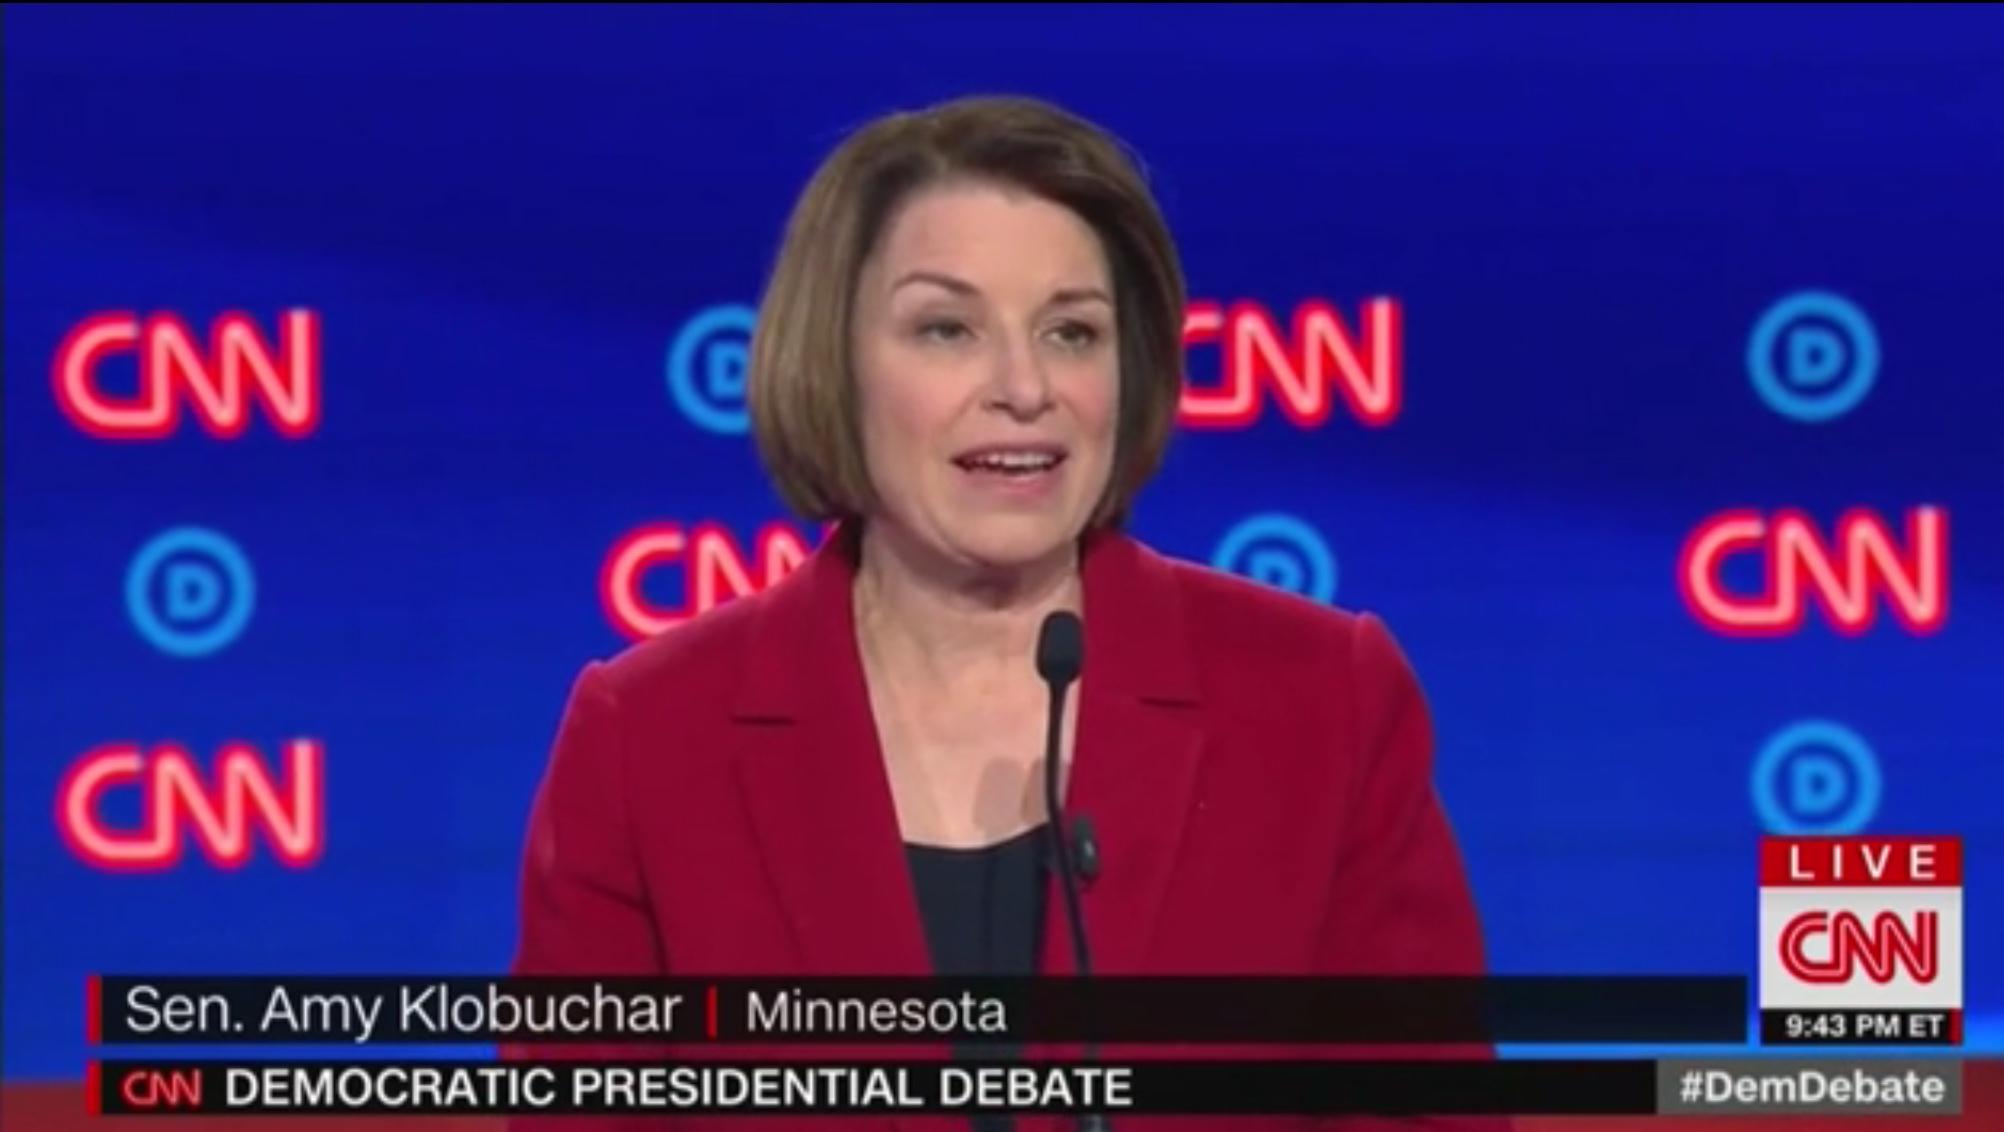 Sen. Amy Klobuchar responds to a question at the Detroit Democratic debate, July 30, 2019. CNN screenshot.